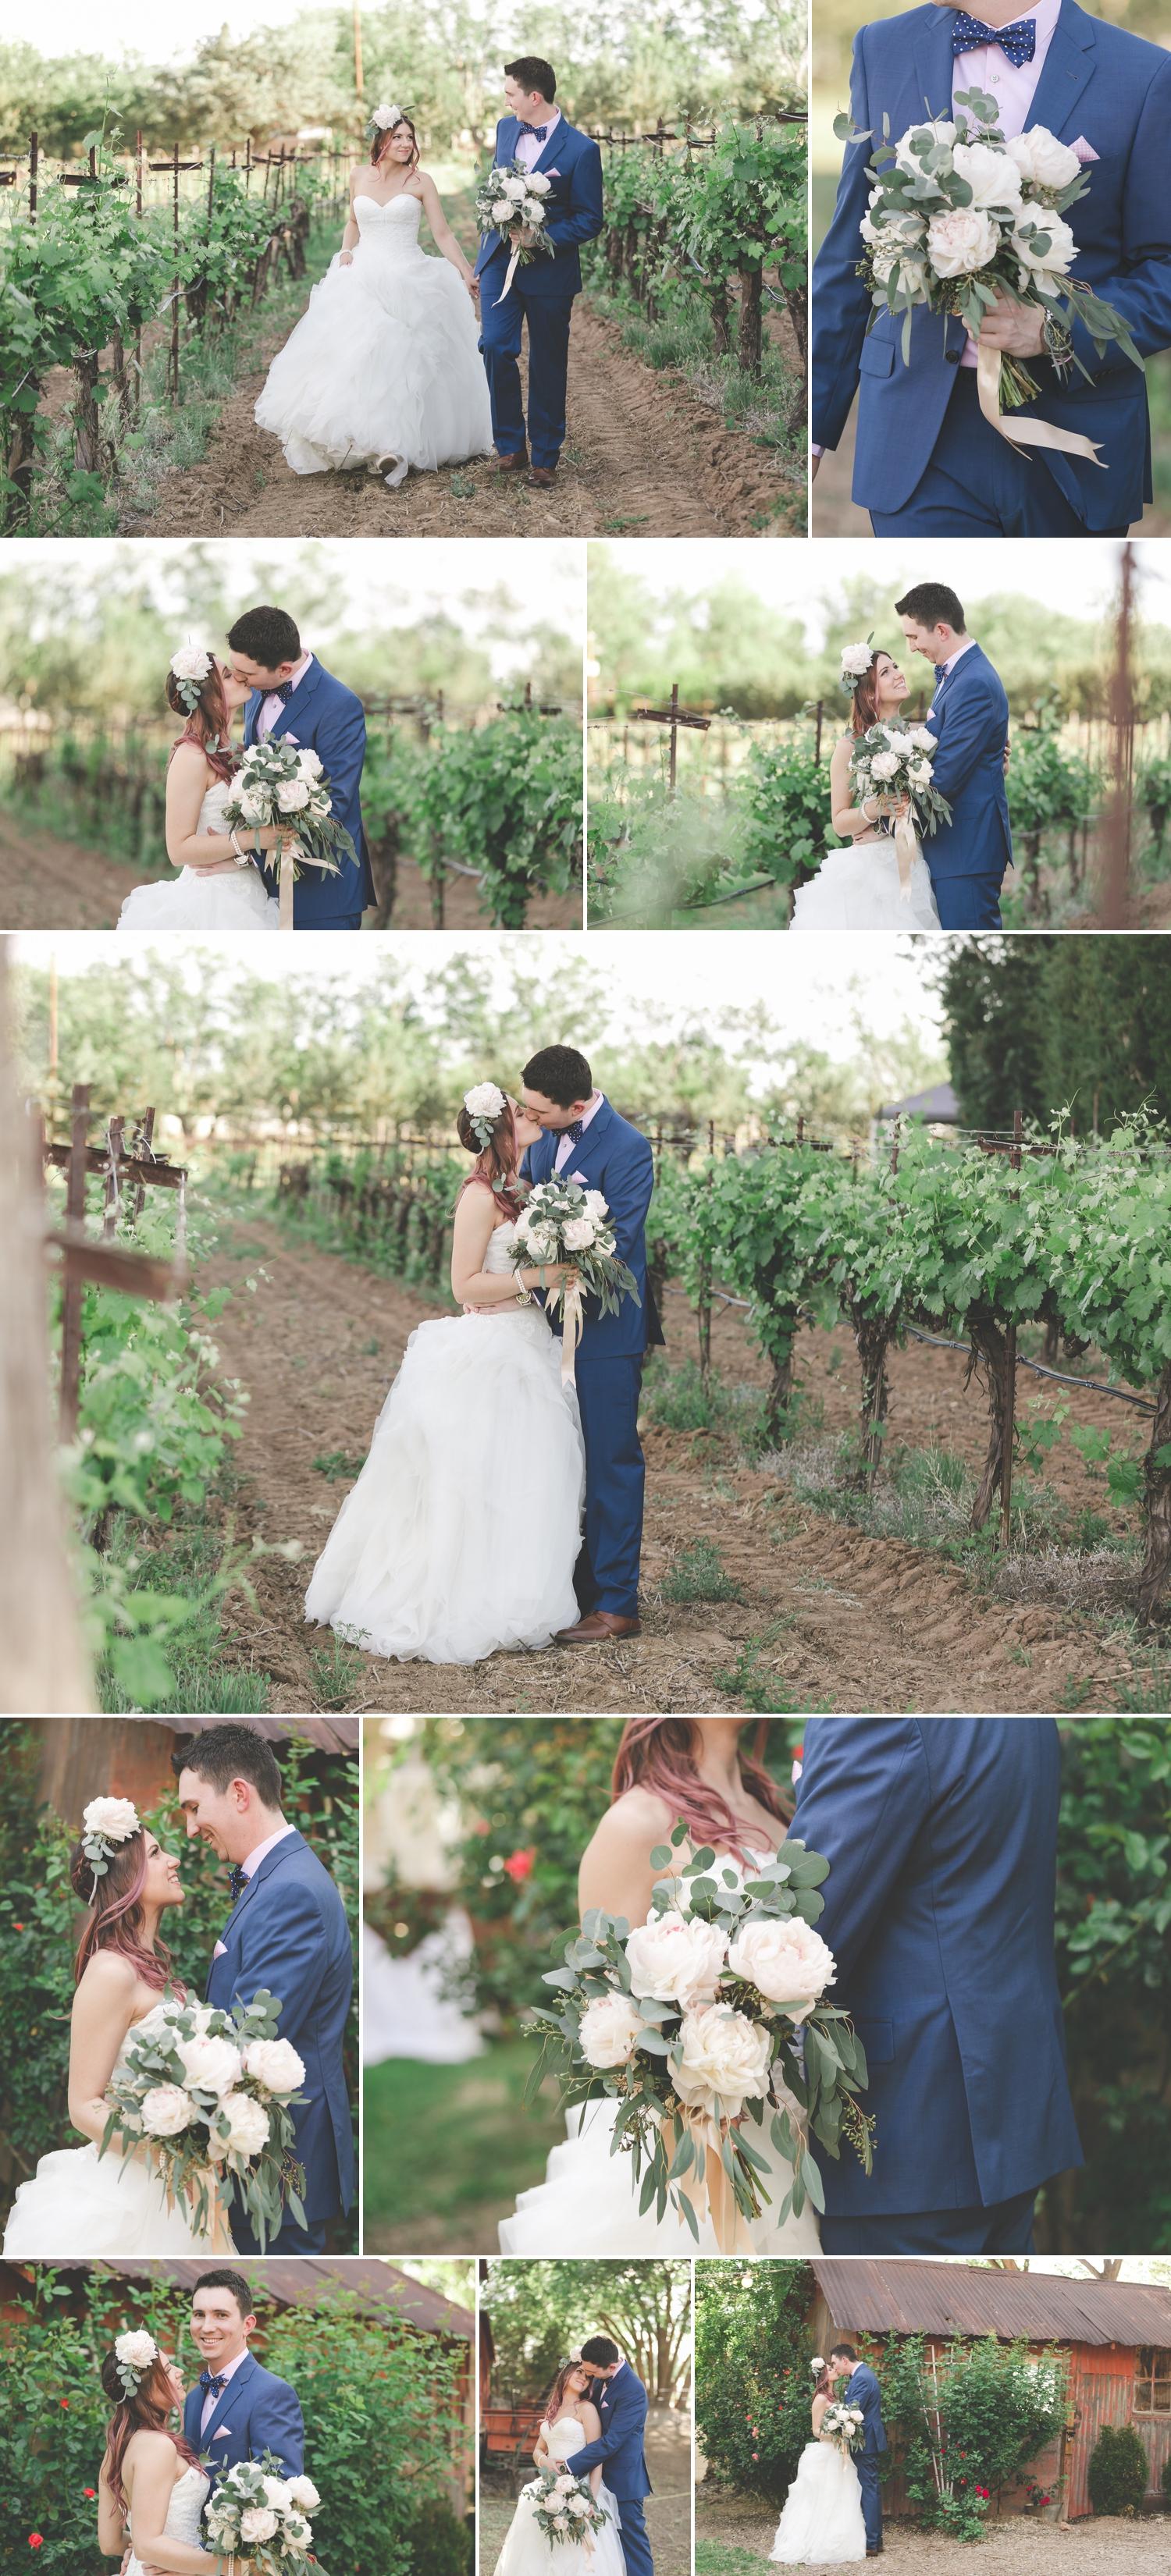 emery inman wedding 3.jpg